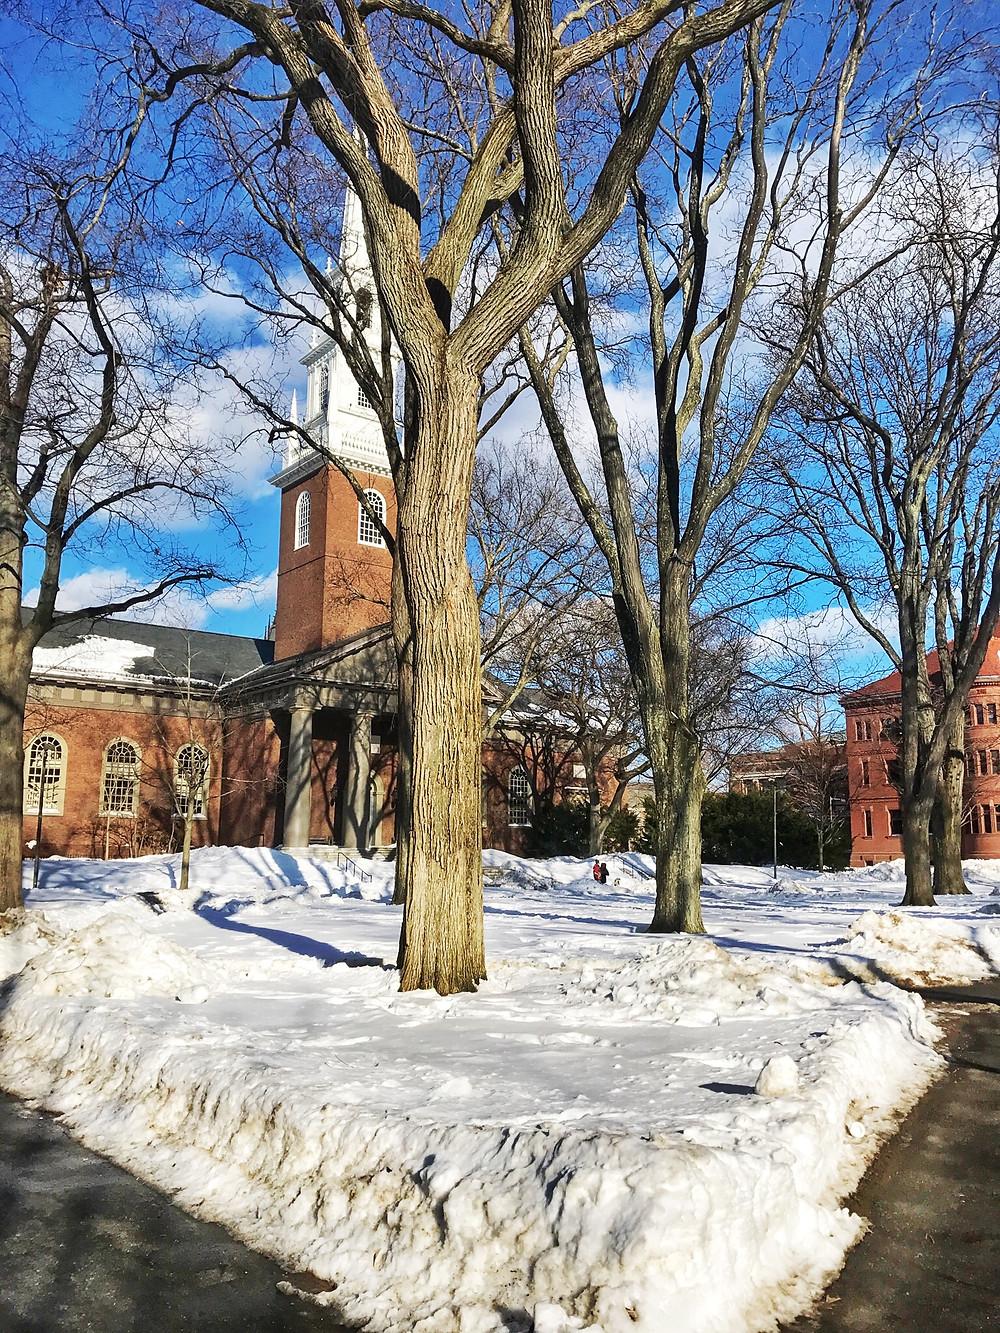 Harvard university, Cambridge, MA. Alien Thoughts international students blog